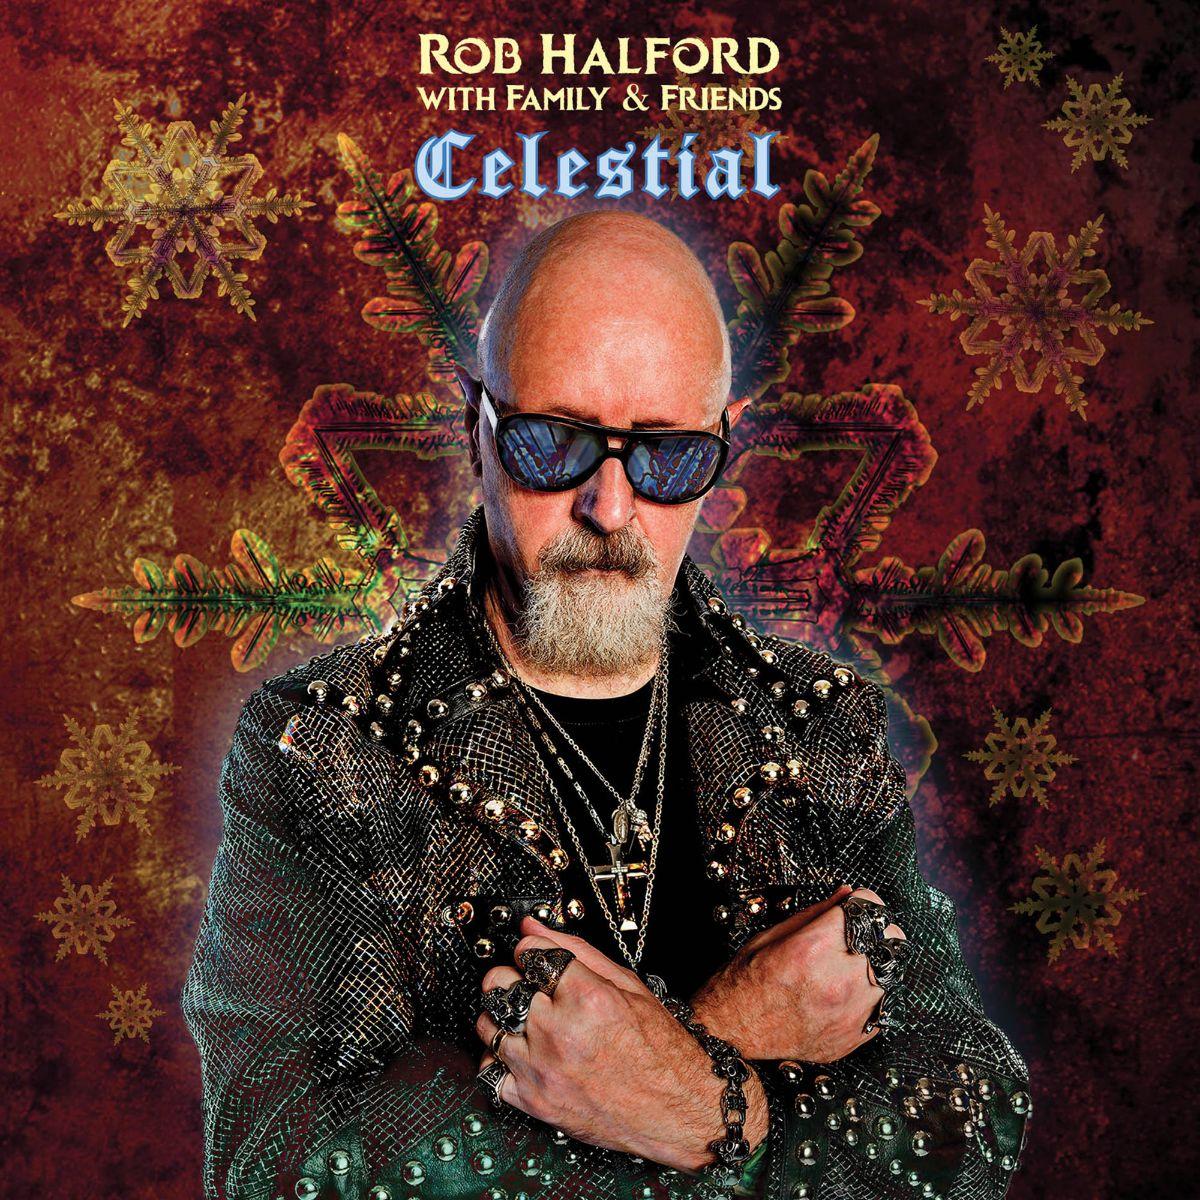 ROB-HALFORD-celestial